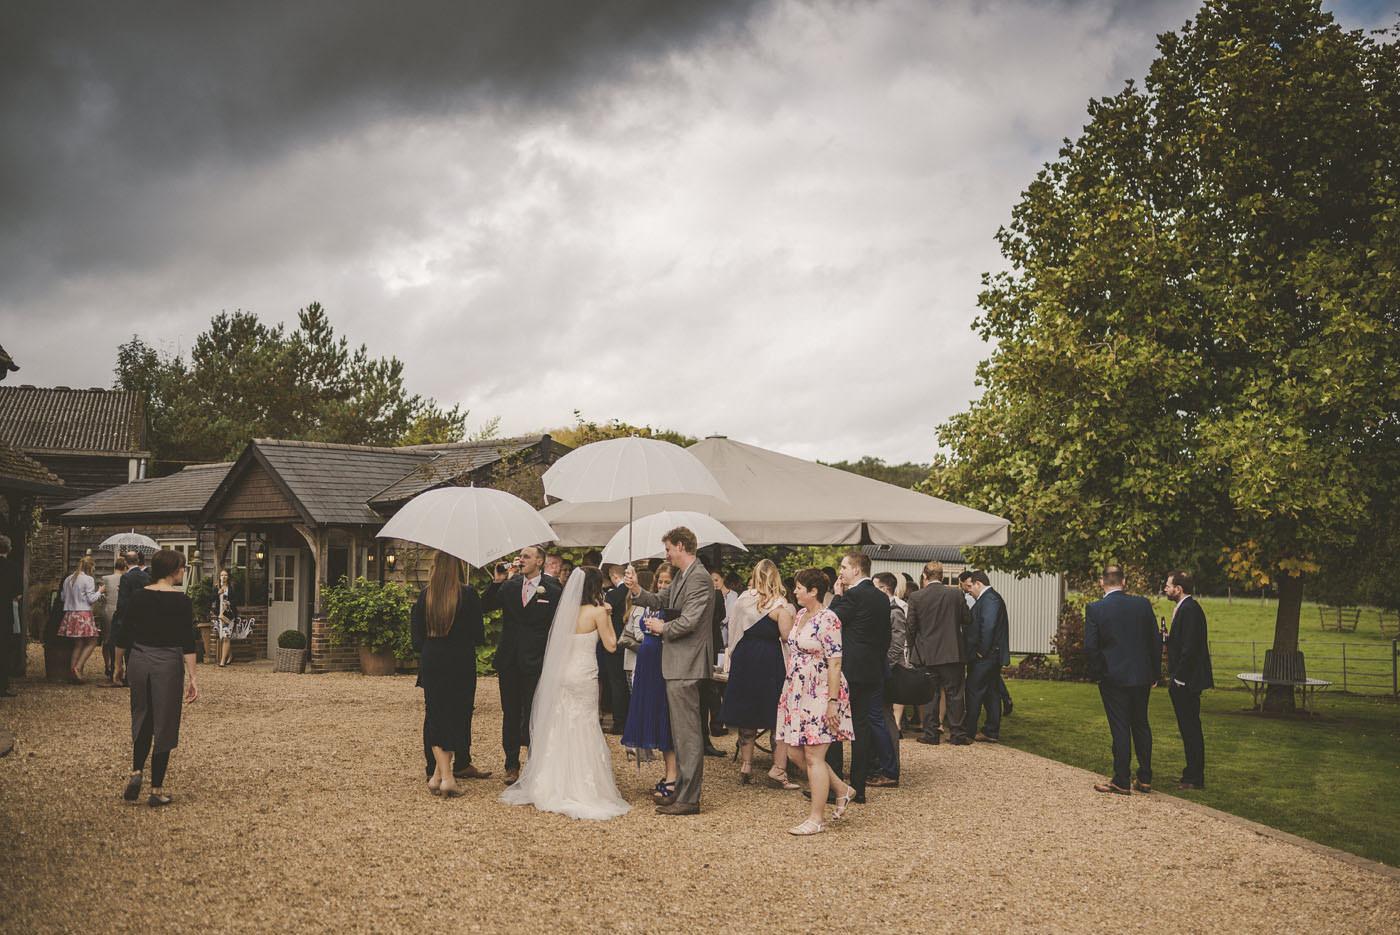 adamzoe gate street barn wedding photographer 0064